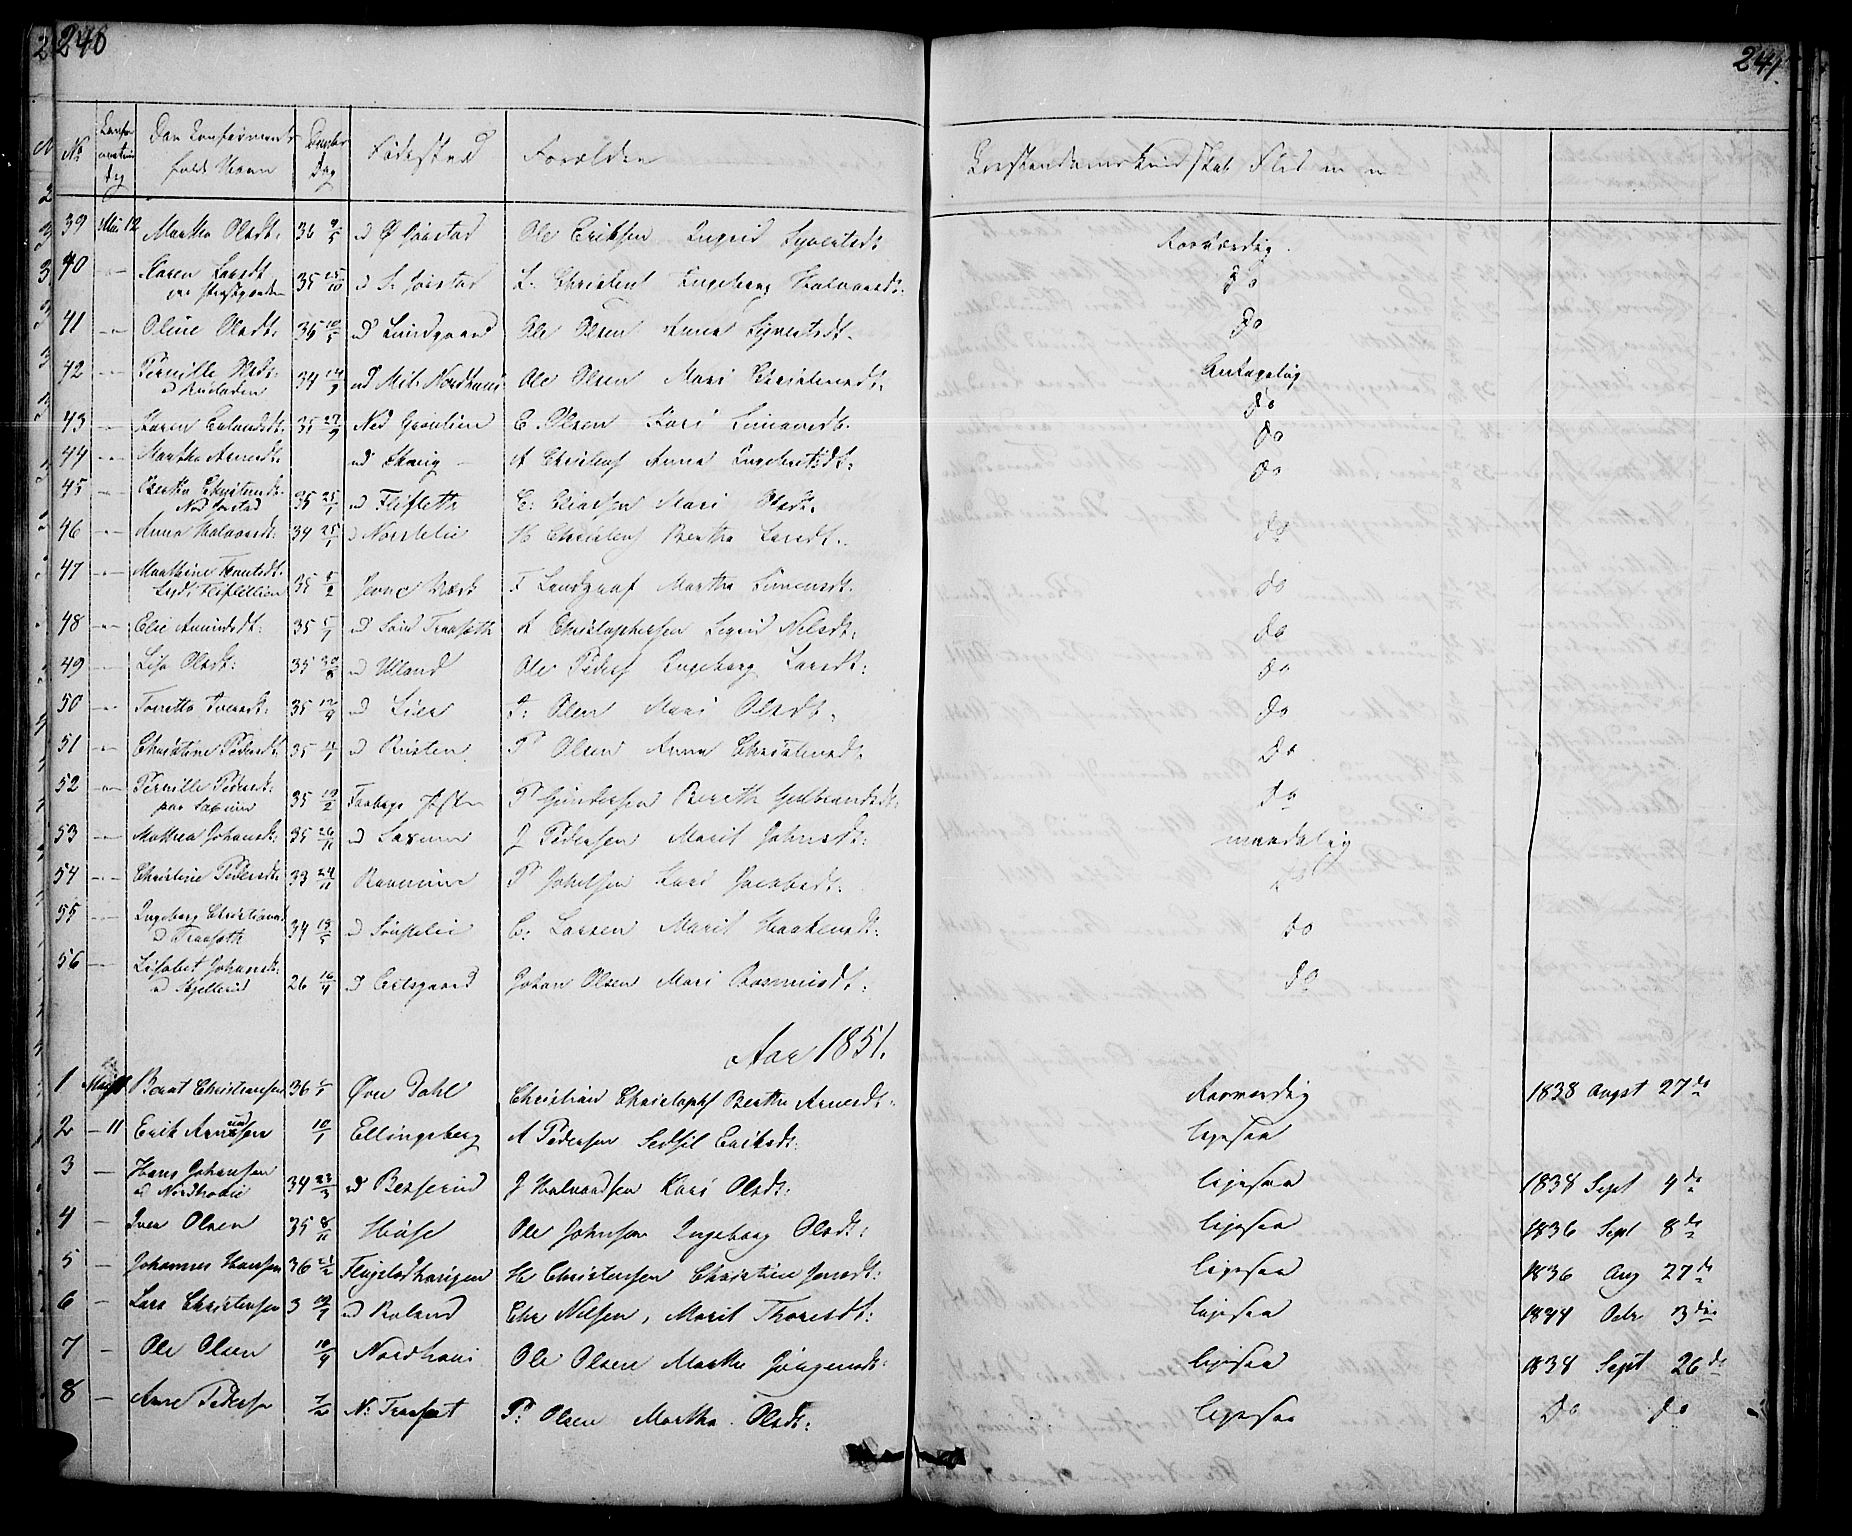 SAH, Fåberg prestekontor, Klokkerbok nr. 5, 1837-1864, s. 240-241